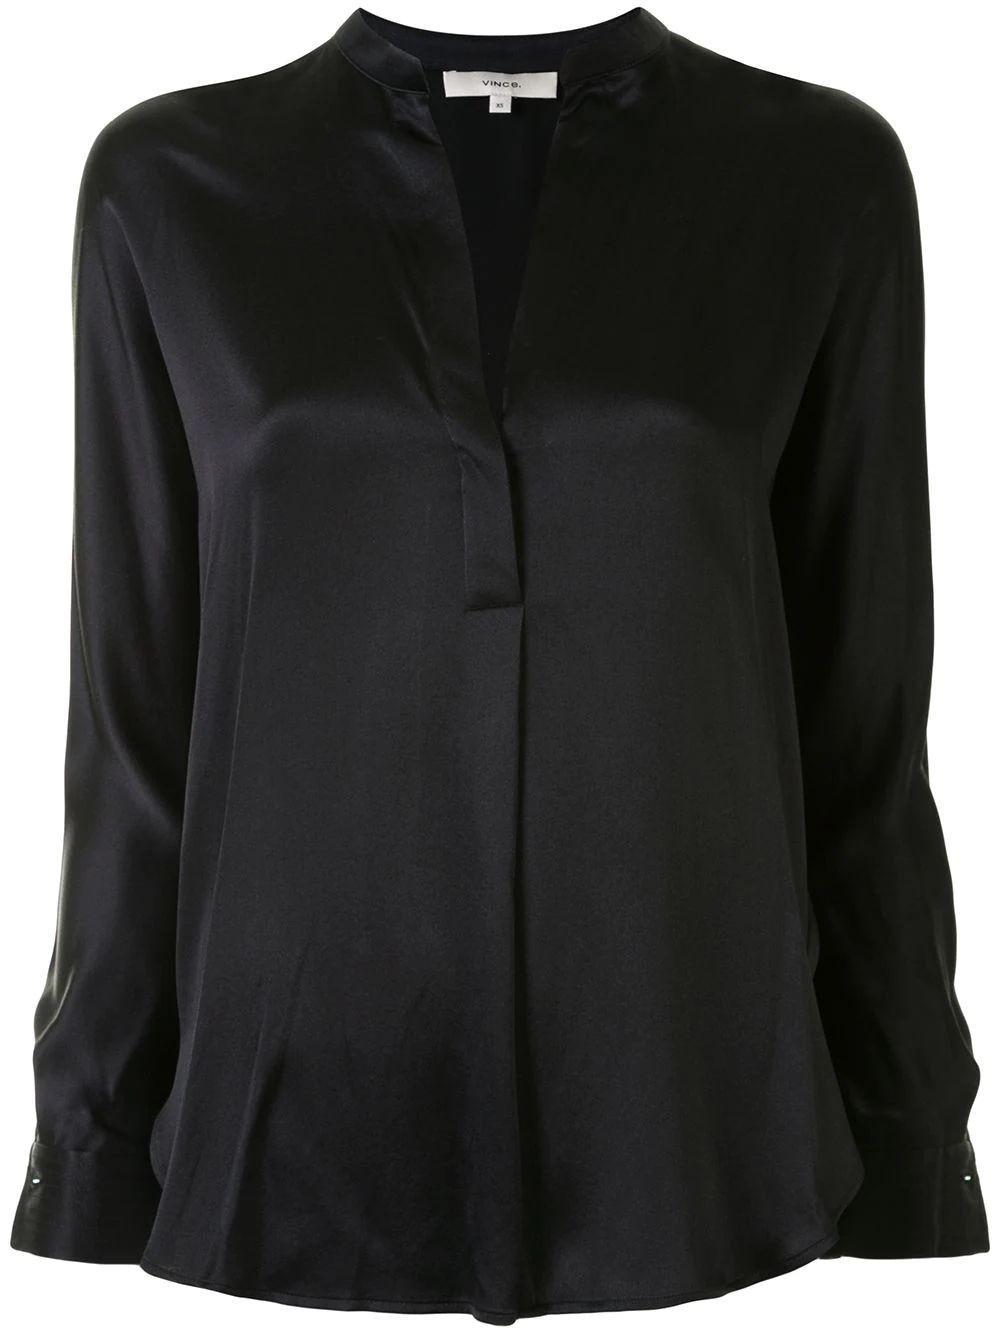 Silk Band Collar Blouse Item # VR84511926